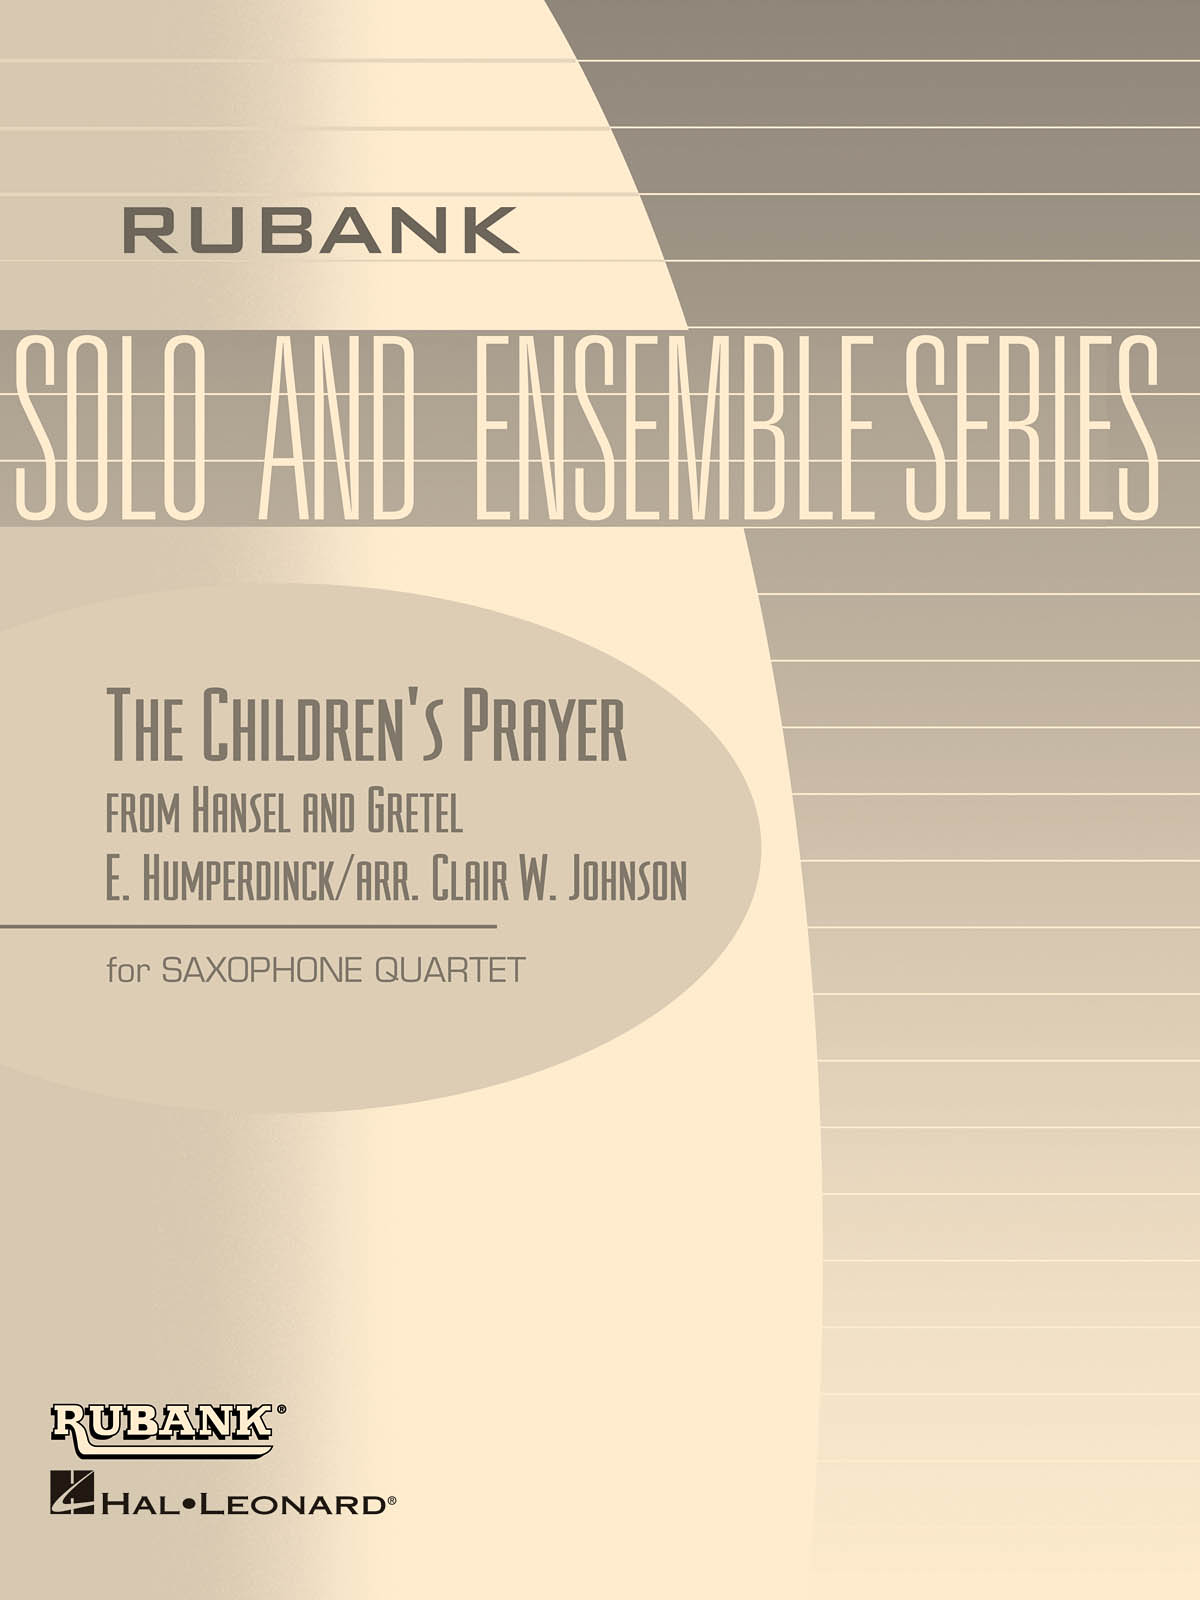 Engelbert Humperdinck: The Childrens' Prayer (from